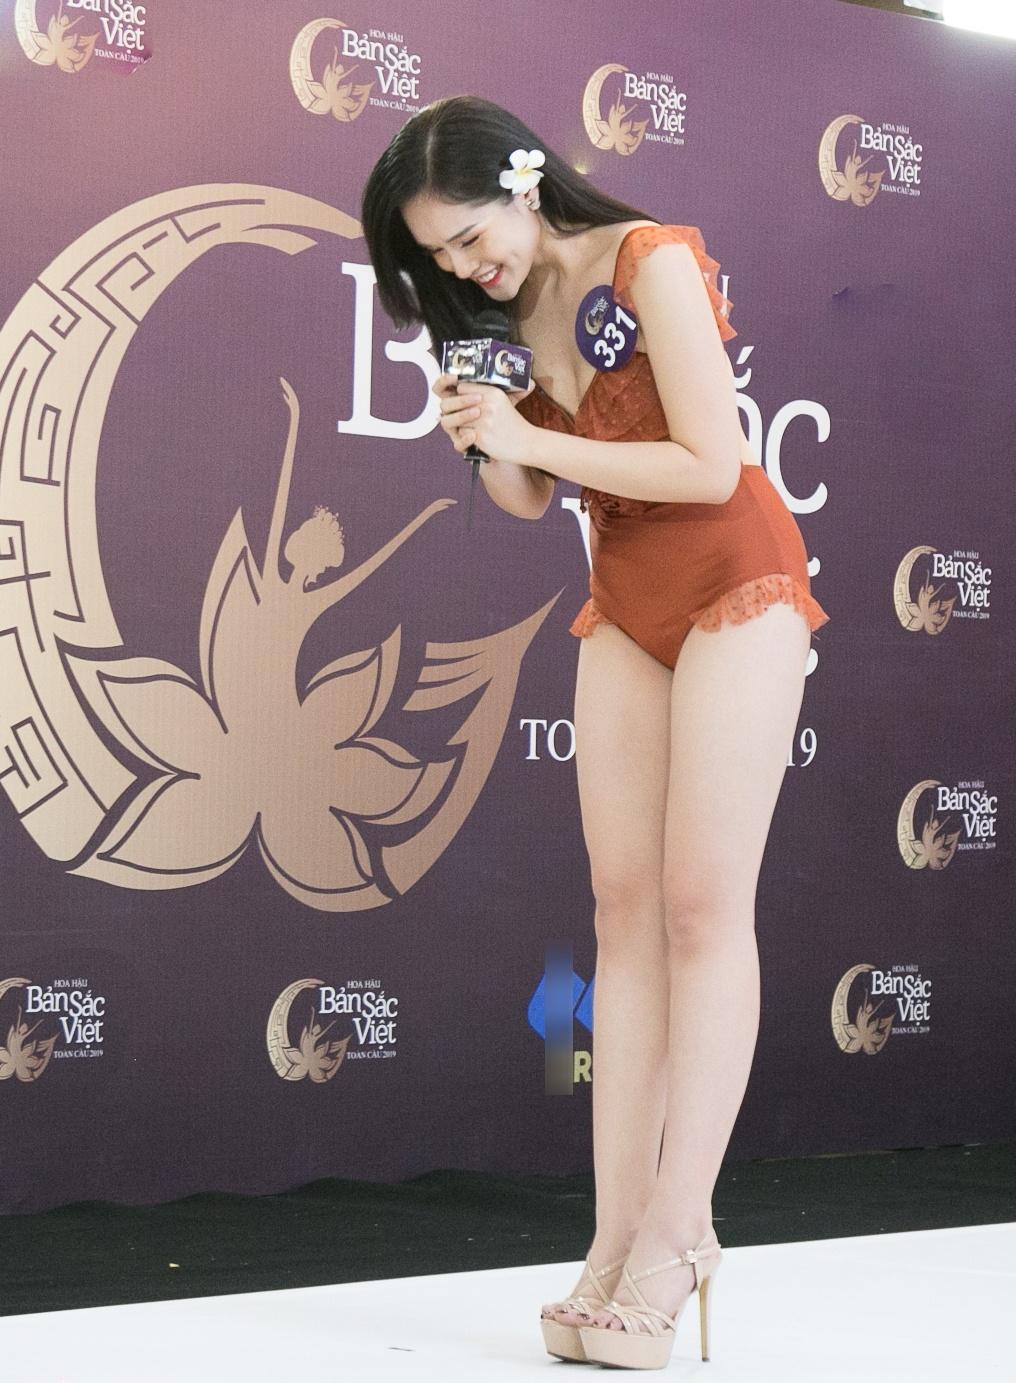 Thi sinh Hoa hau Ban sac Viet mac ao tam thi hinh the: Mat xinh, eo to hinh anh 2